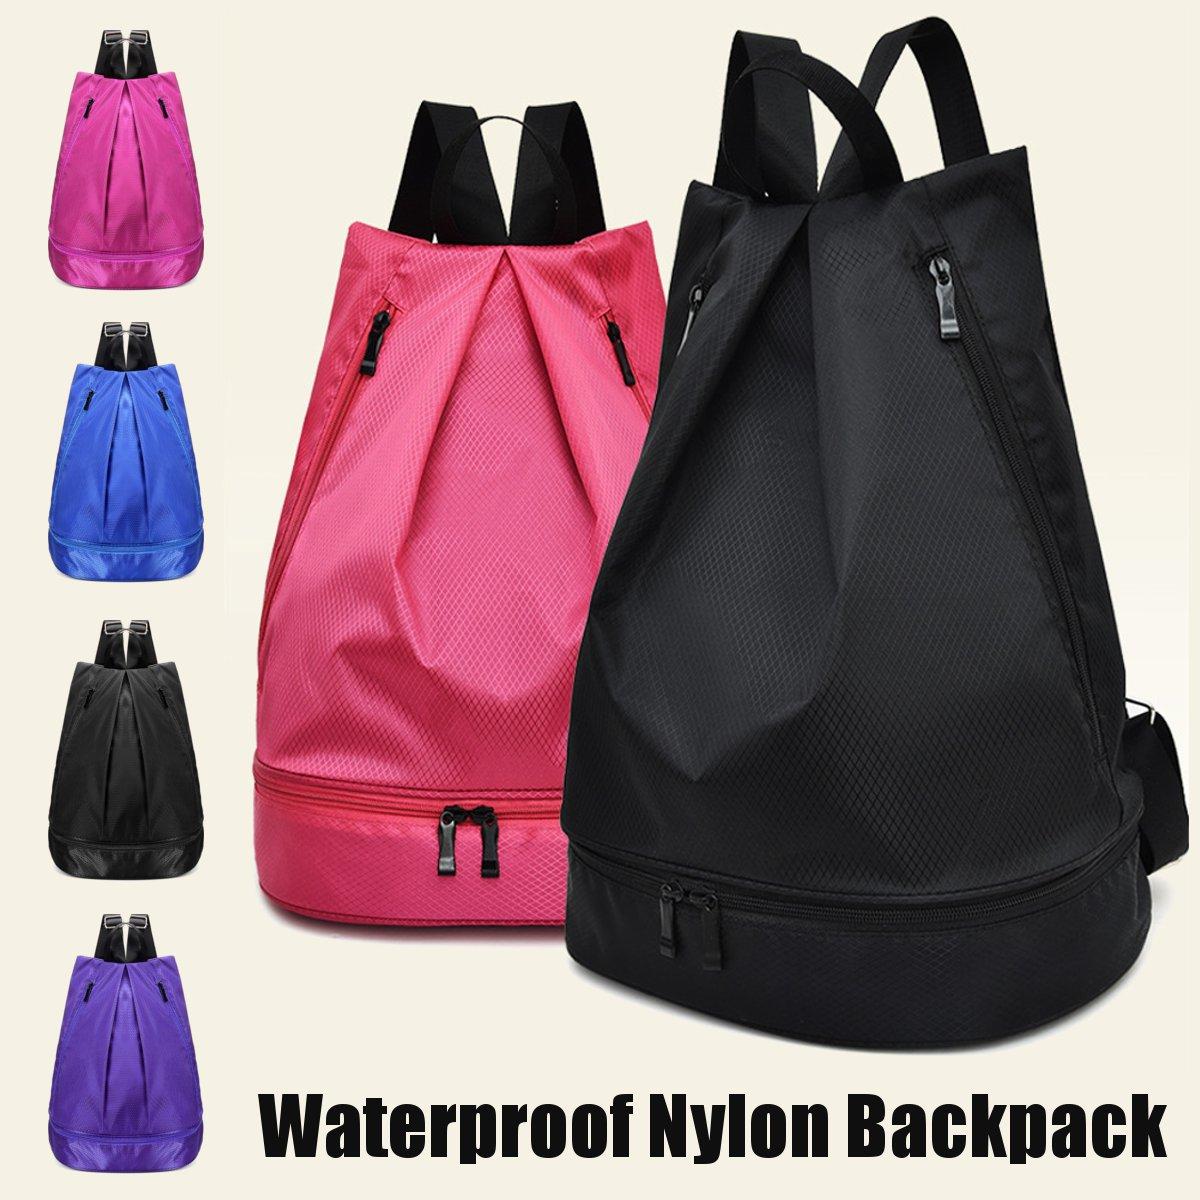 Nylon Shoulder Backpack Waterproof Travel Gym Sport Bags Yoga School Storage Carry Bag  Outdoor Training Travel Hiking Bag